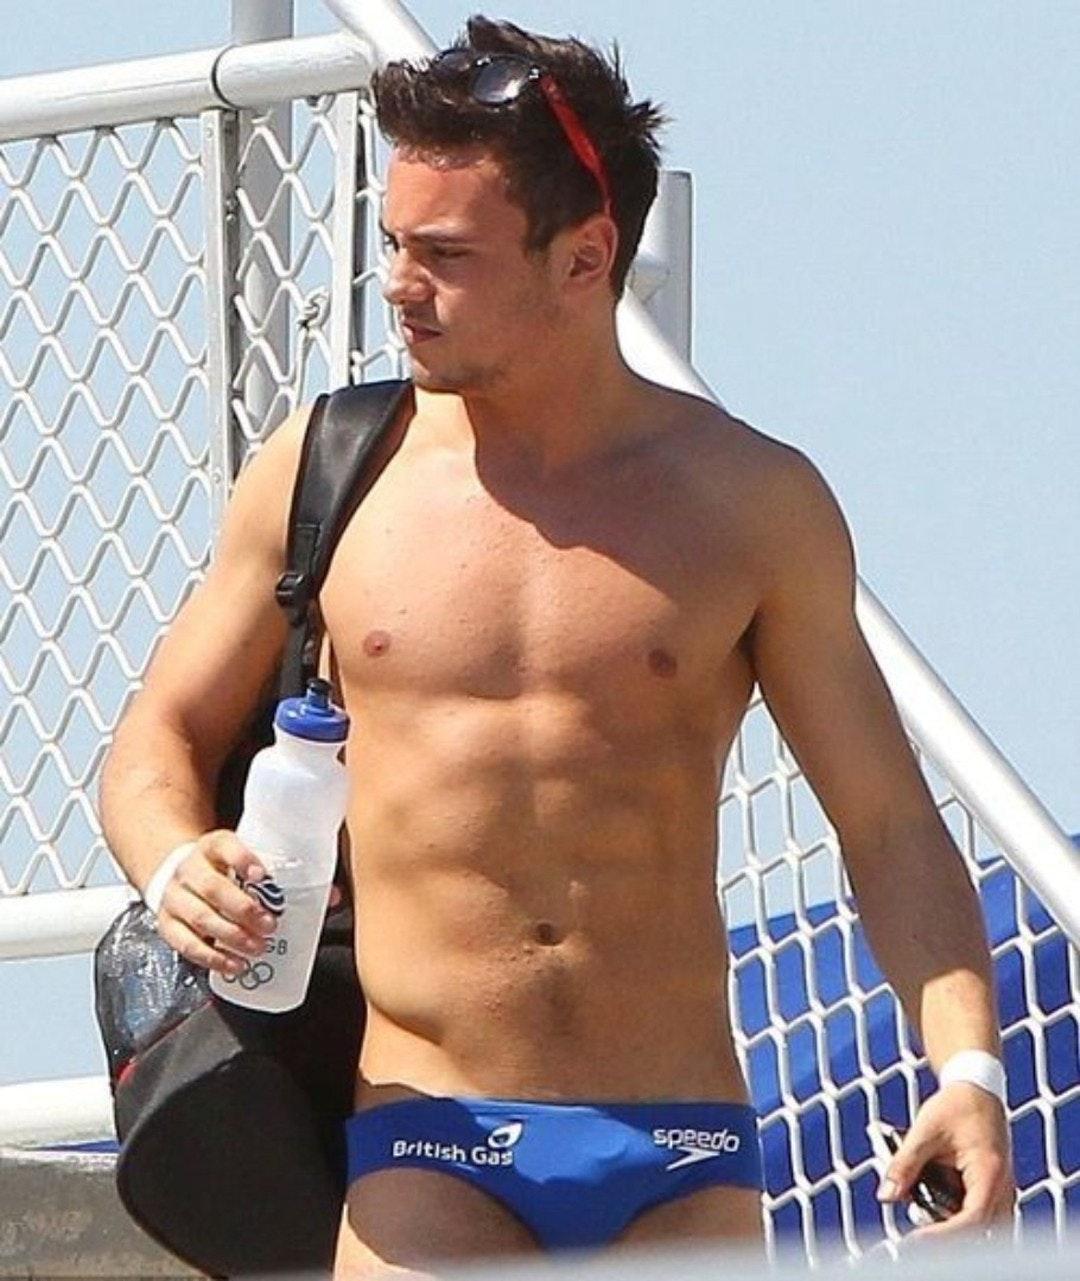 #tomdaley #men #speedo #malecelebs #shirtlessguys #abs